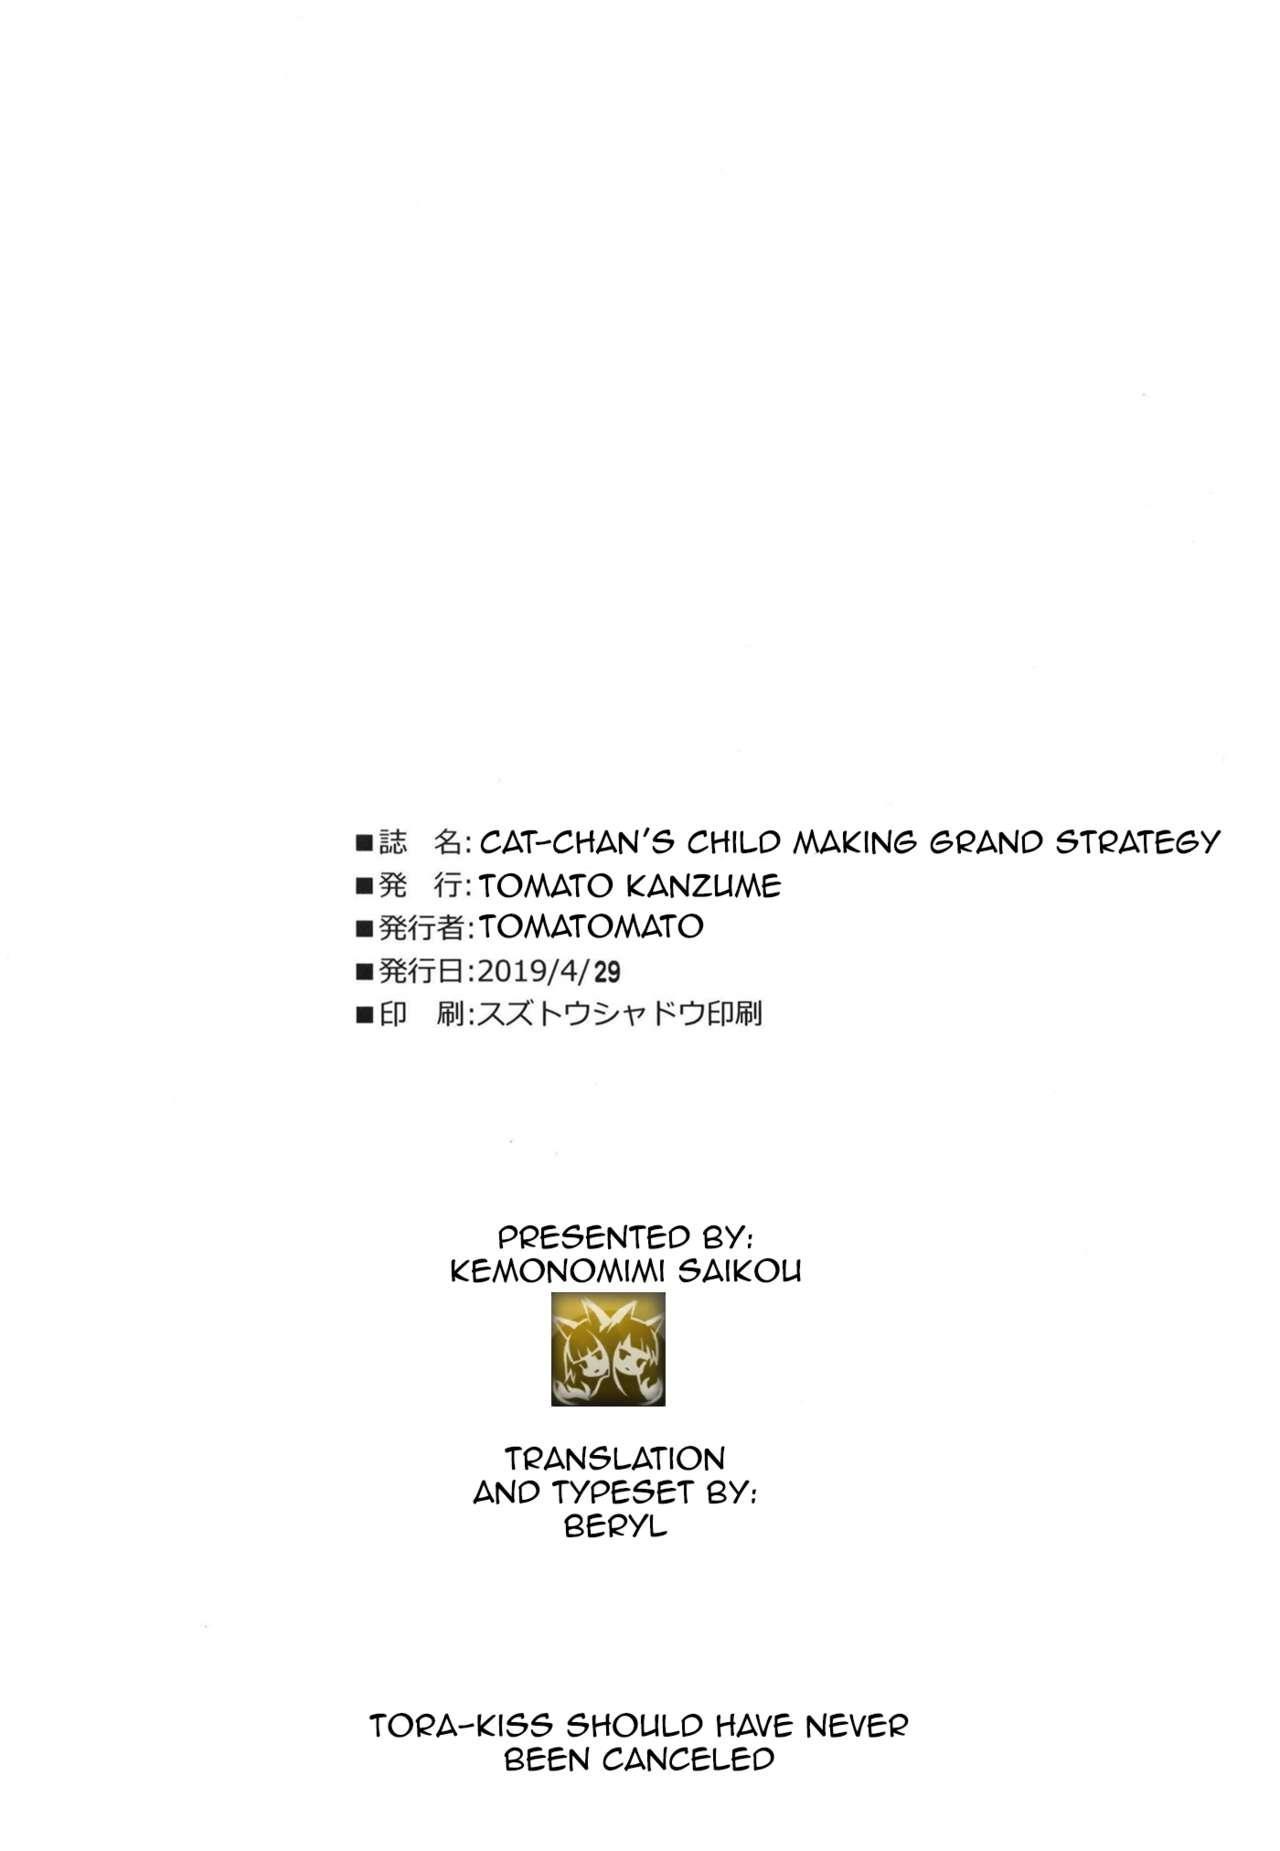 [Tomato Kanzume (Tomatomato)] Cat-chan Kozukuri Daisakusen | Cat-chan's Childmaking Grand Strategy (Fate/Grand Order) [English] [Kemonomimi Saikou] [Digital] 21